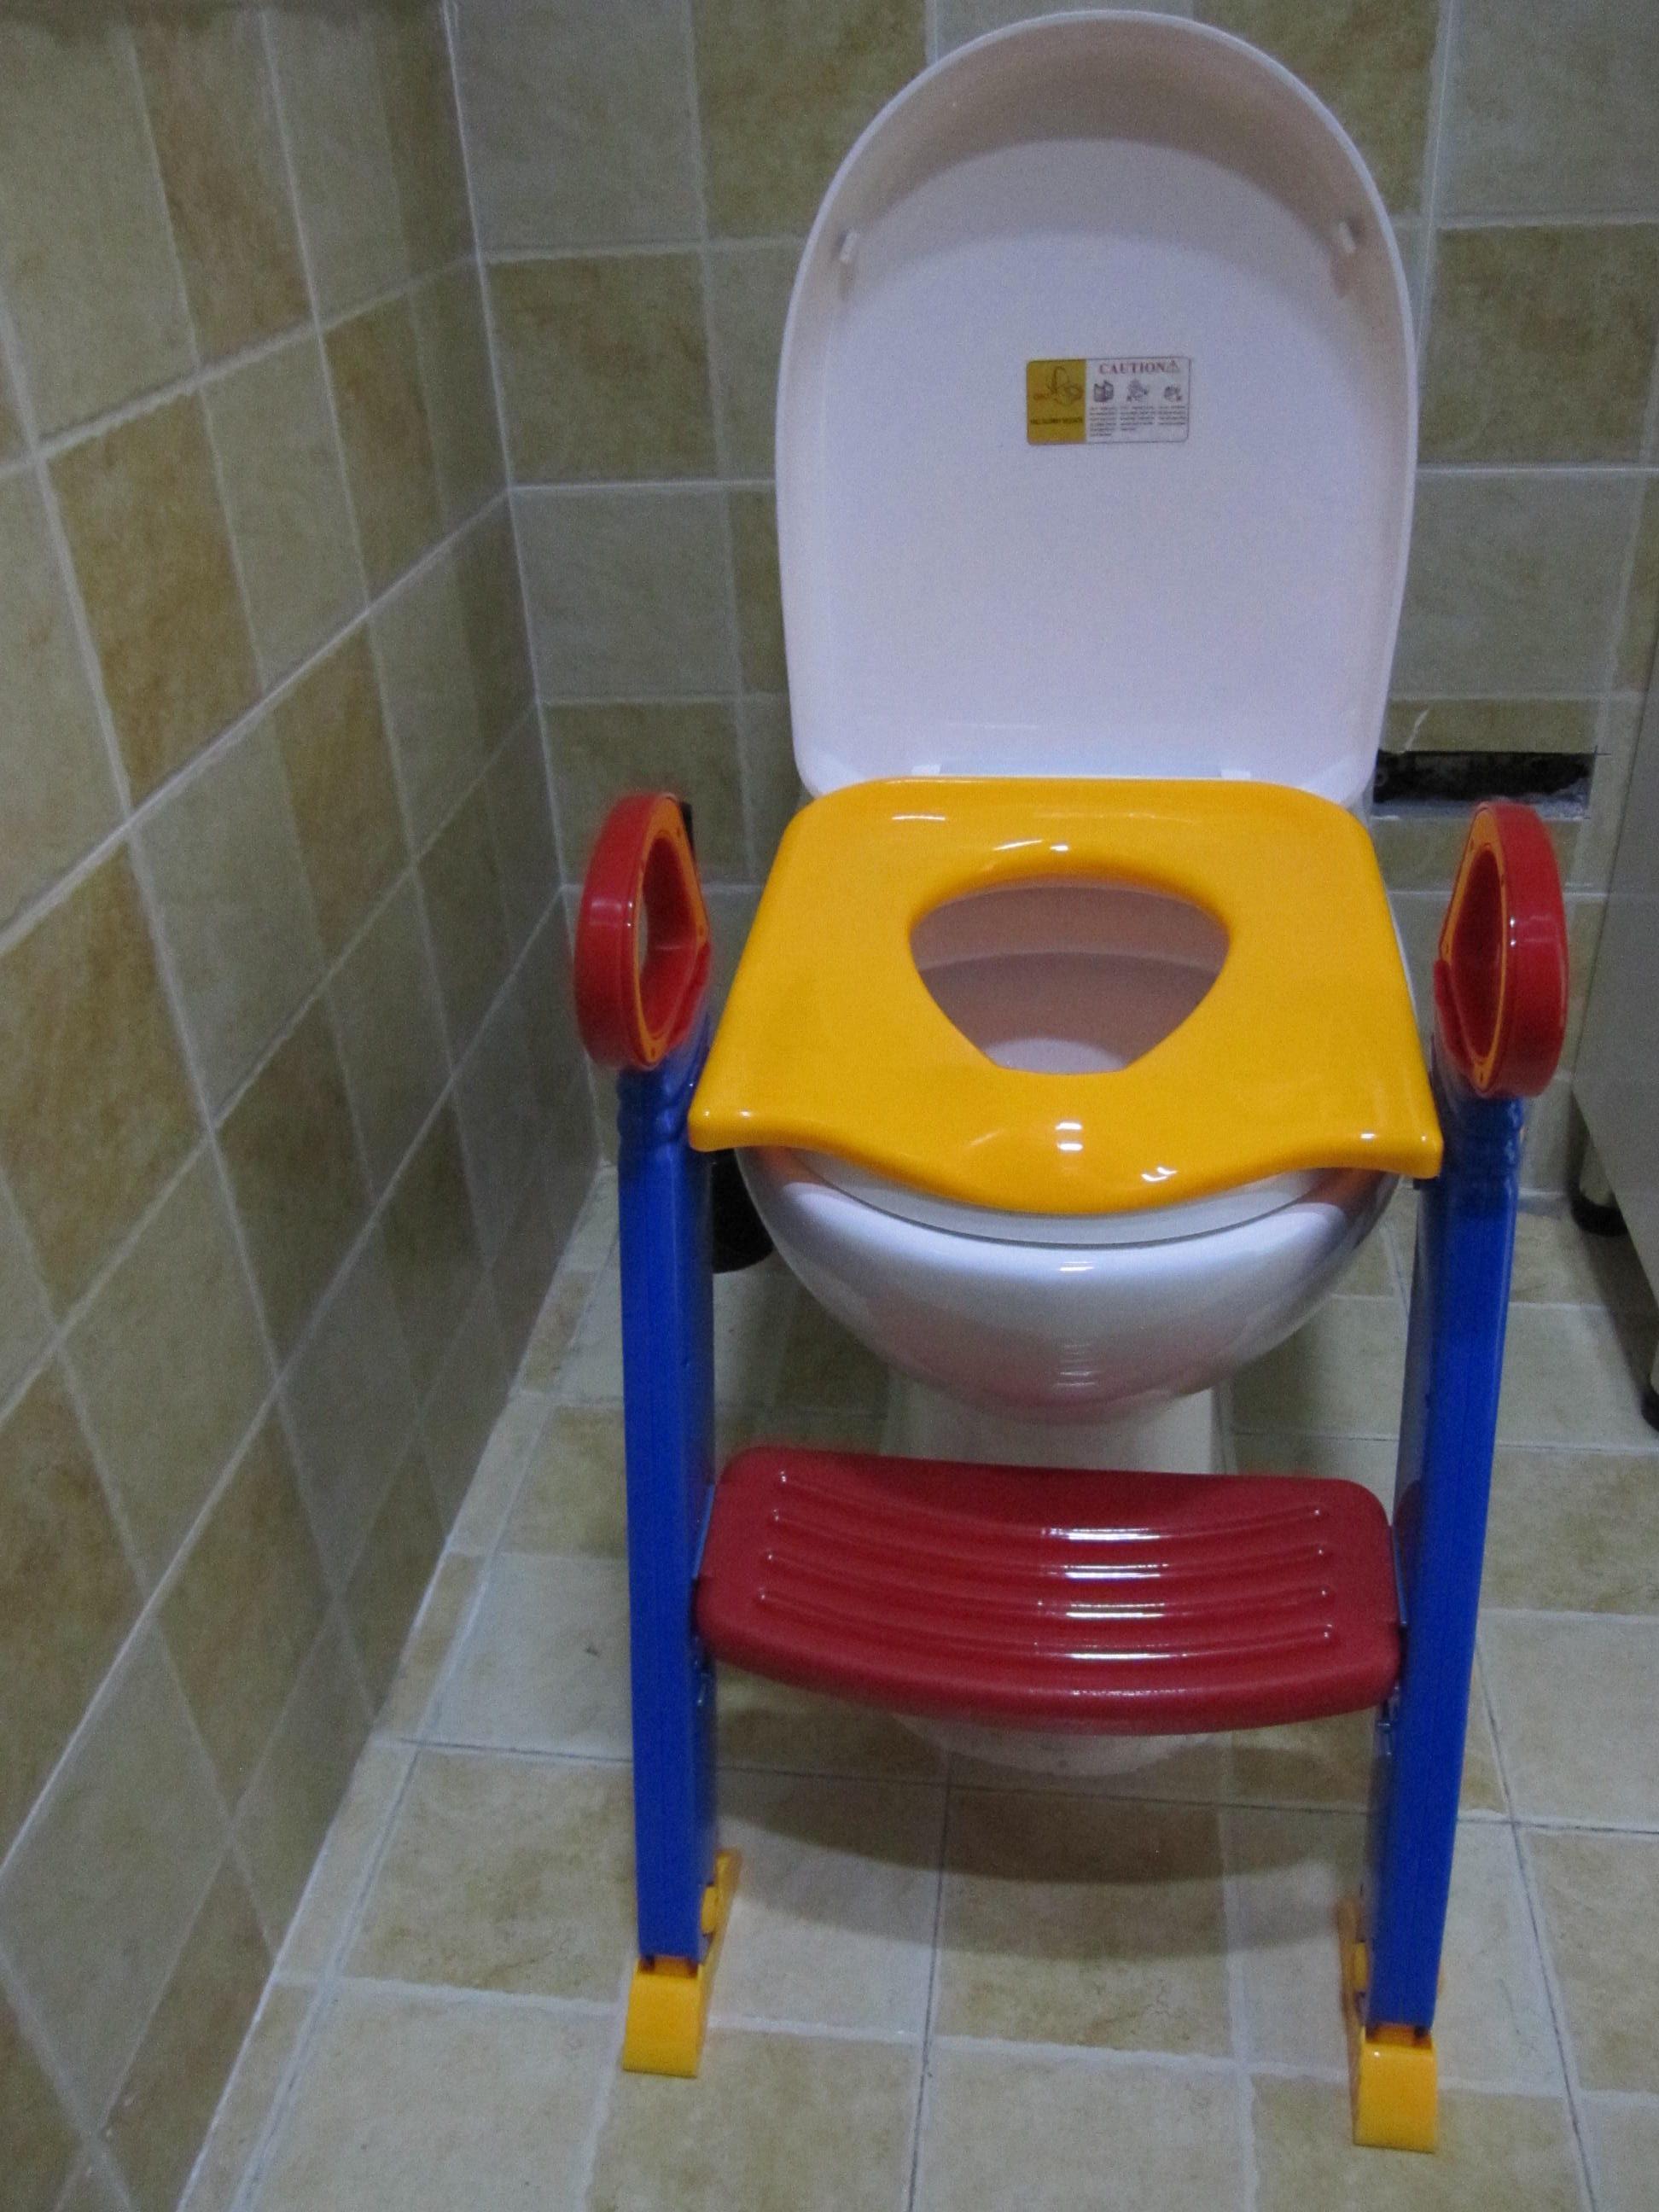 JDM Kids Toilet Training Potty Seat Children's toilet ...